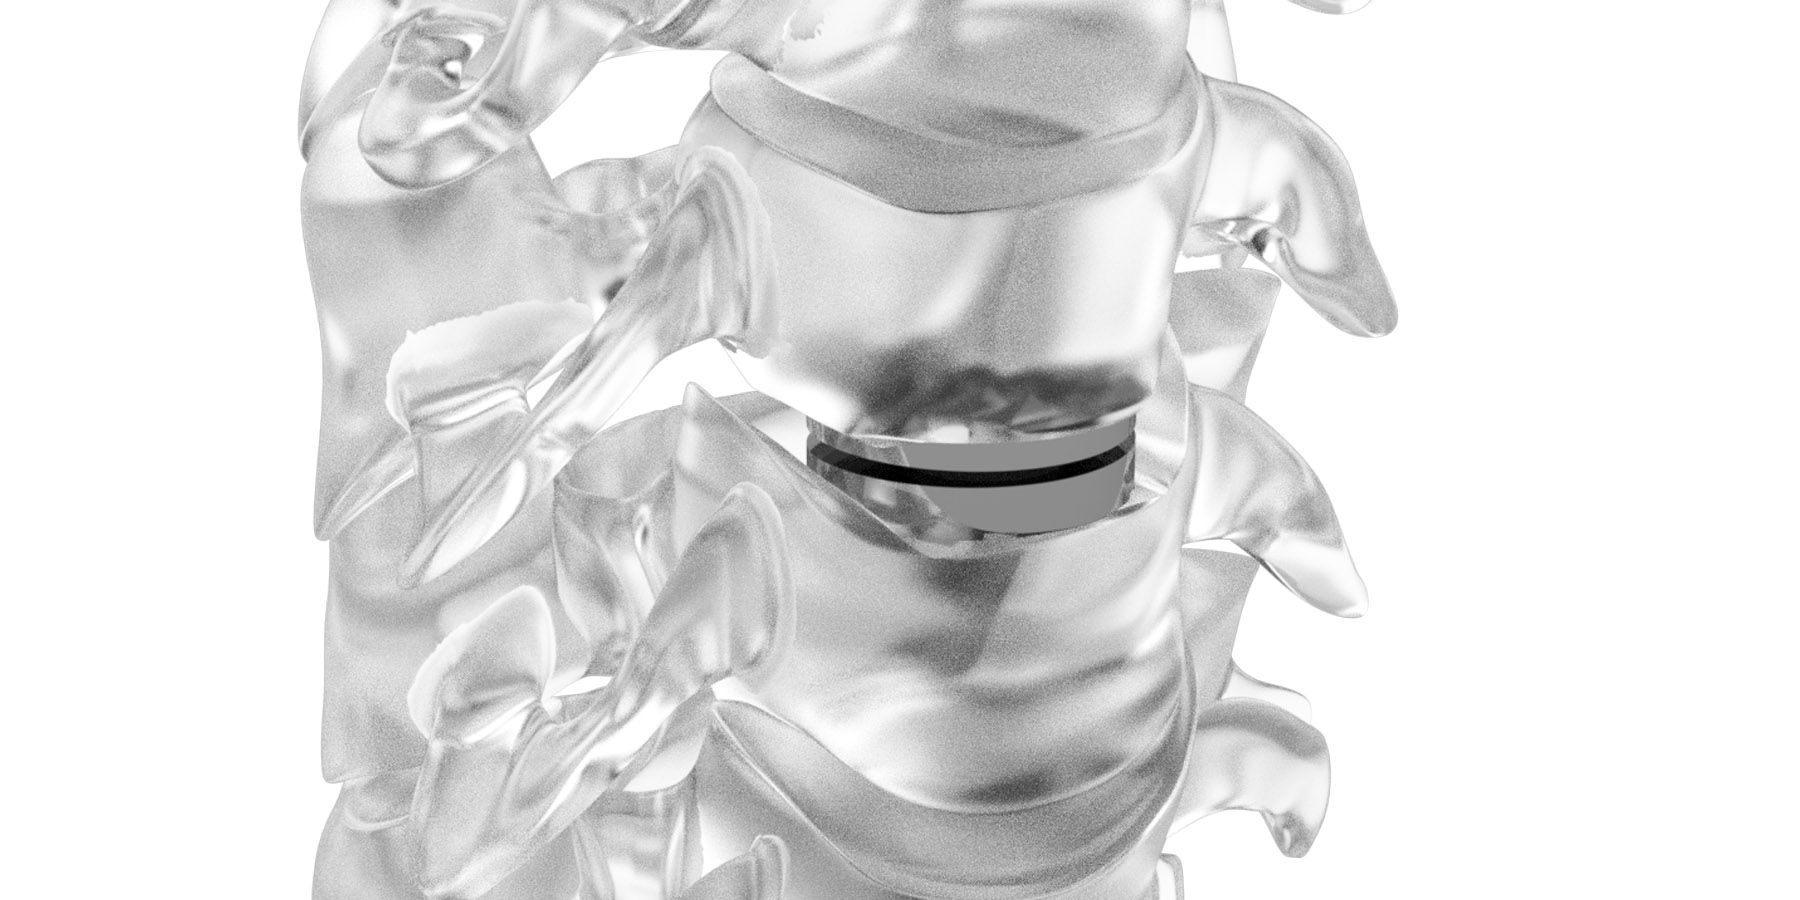 neuro-france-implants-dynalis-1